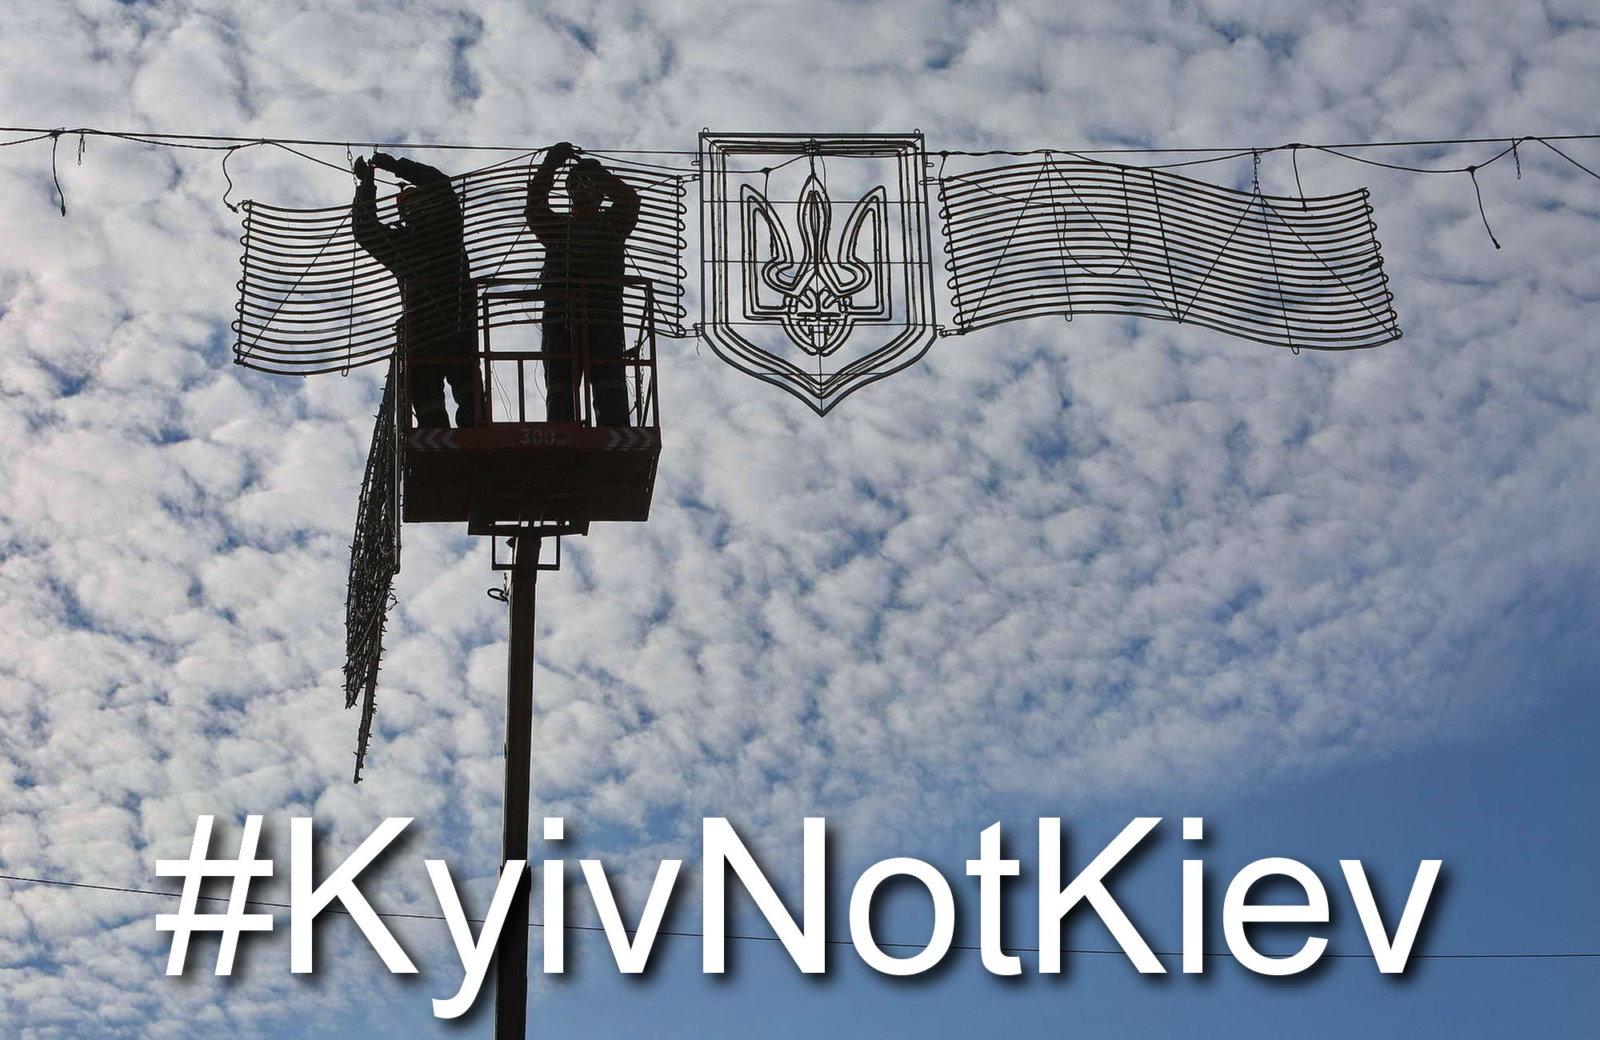 Kyiv not Kiev: US changes spelling of Ukrainian capital